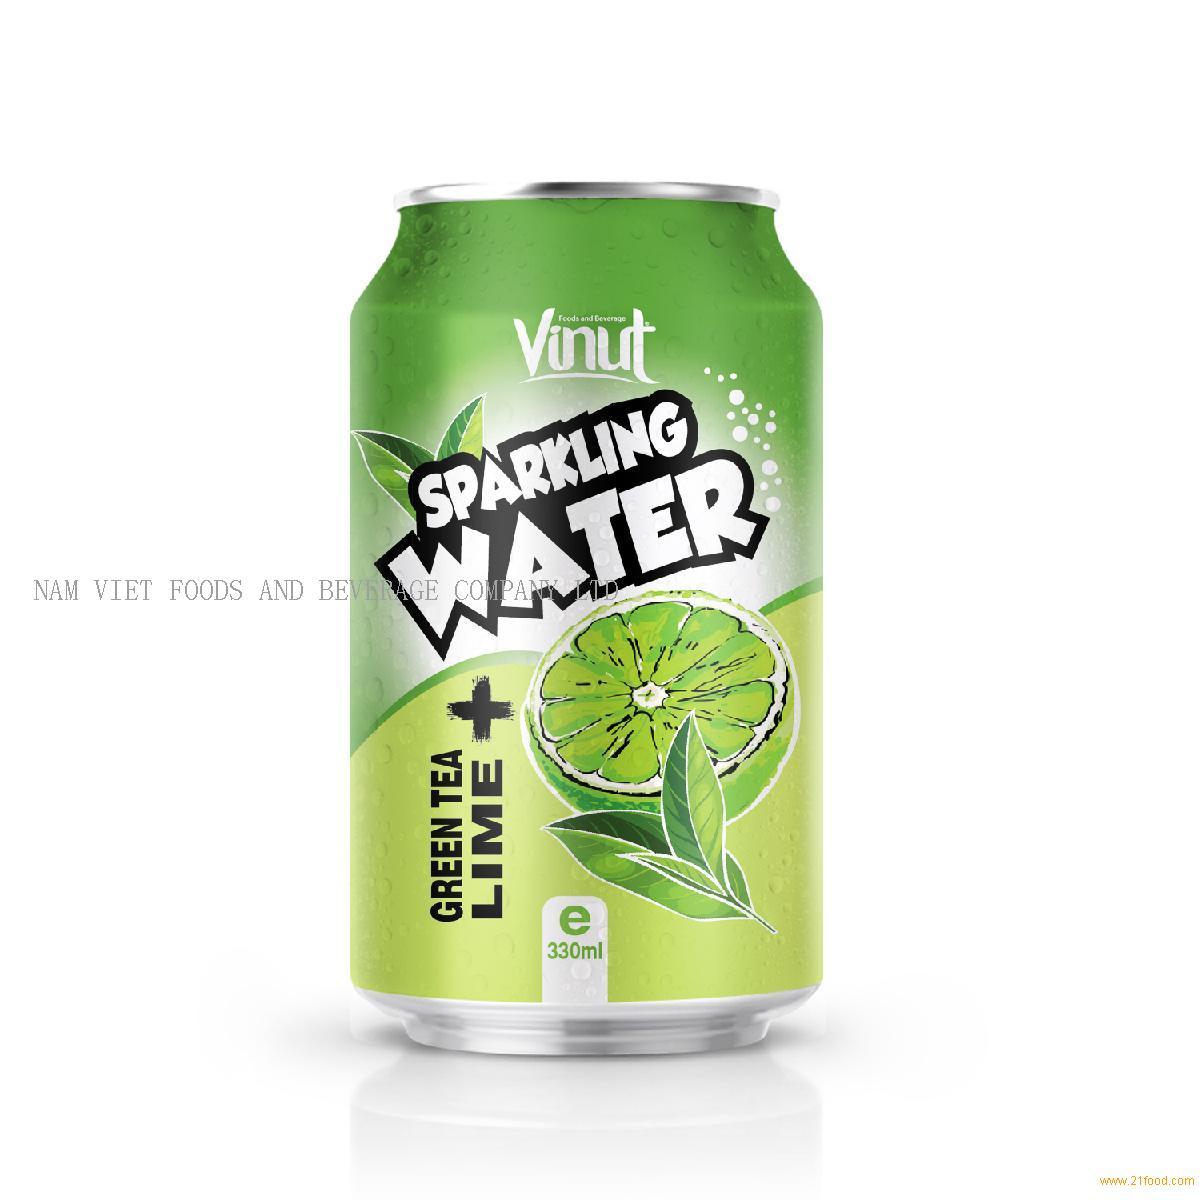 330ml VINUT Green tea Lime Sparkling water